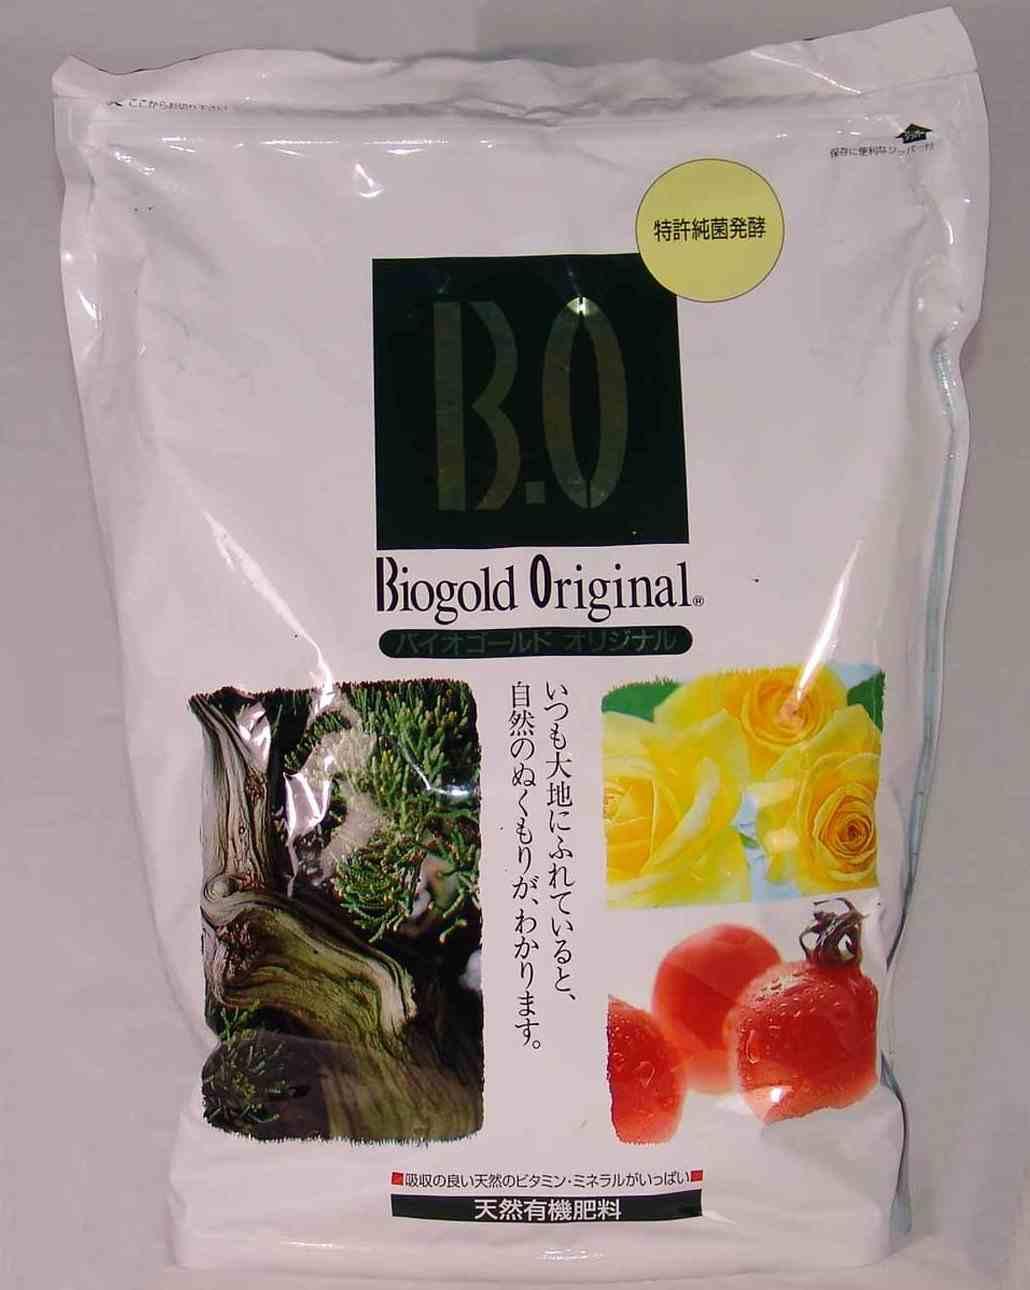 Bio-Gold Original Slow Release Fertiliser 5 kg £75